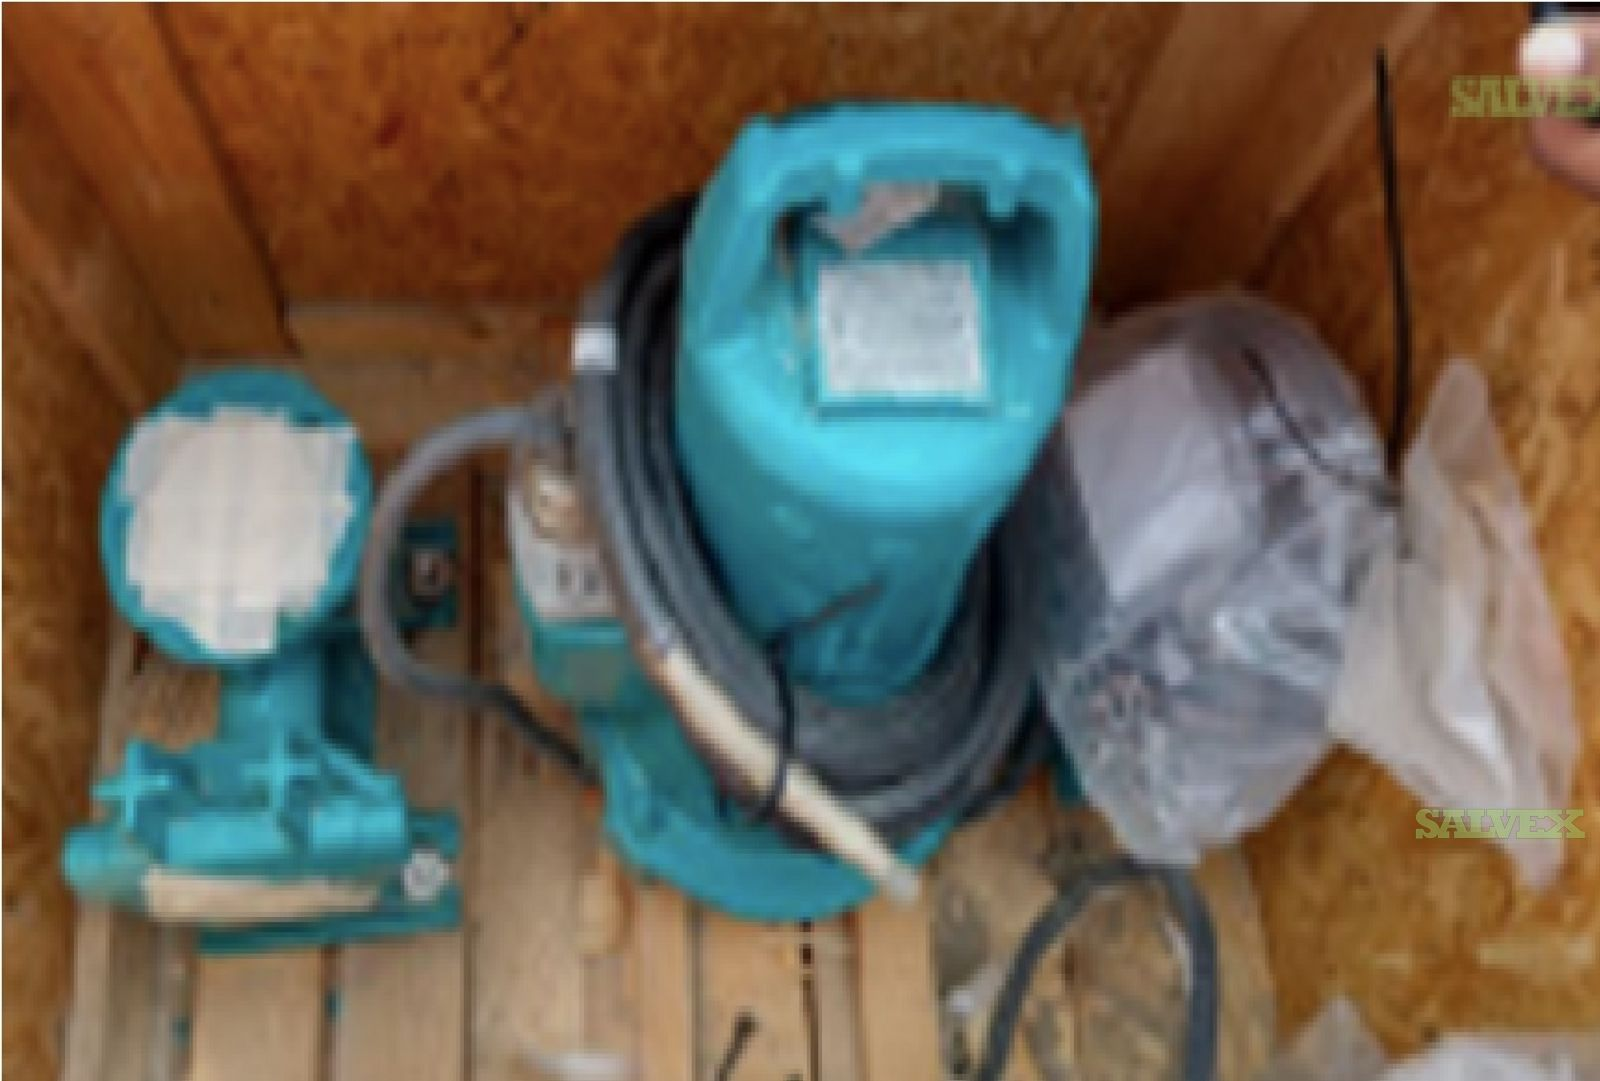 KSB Wastewater Pumps